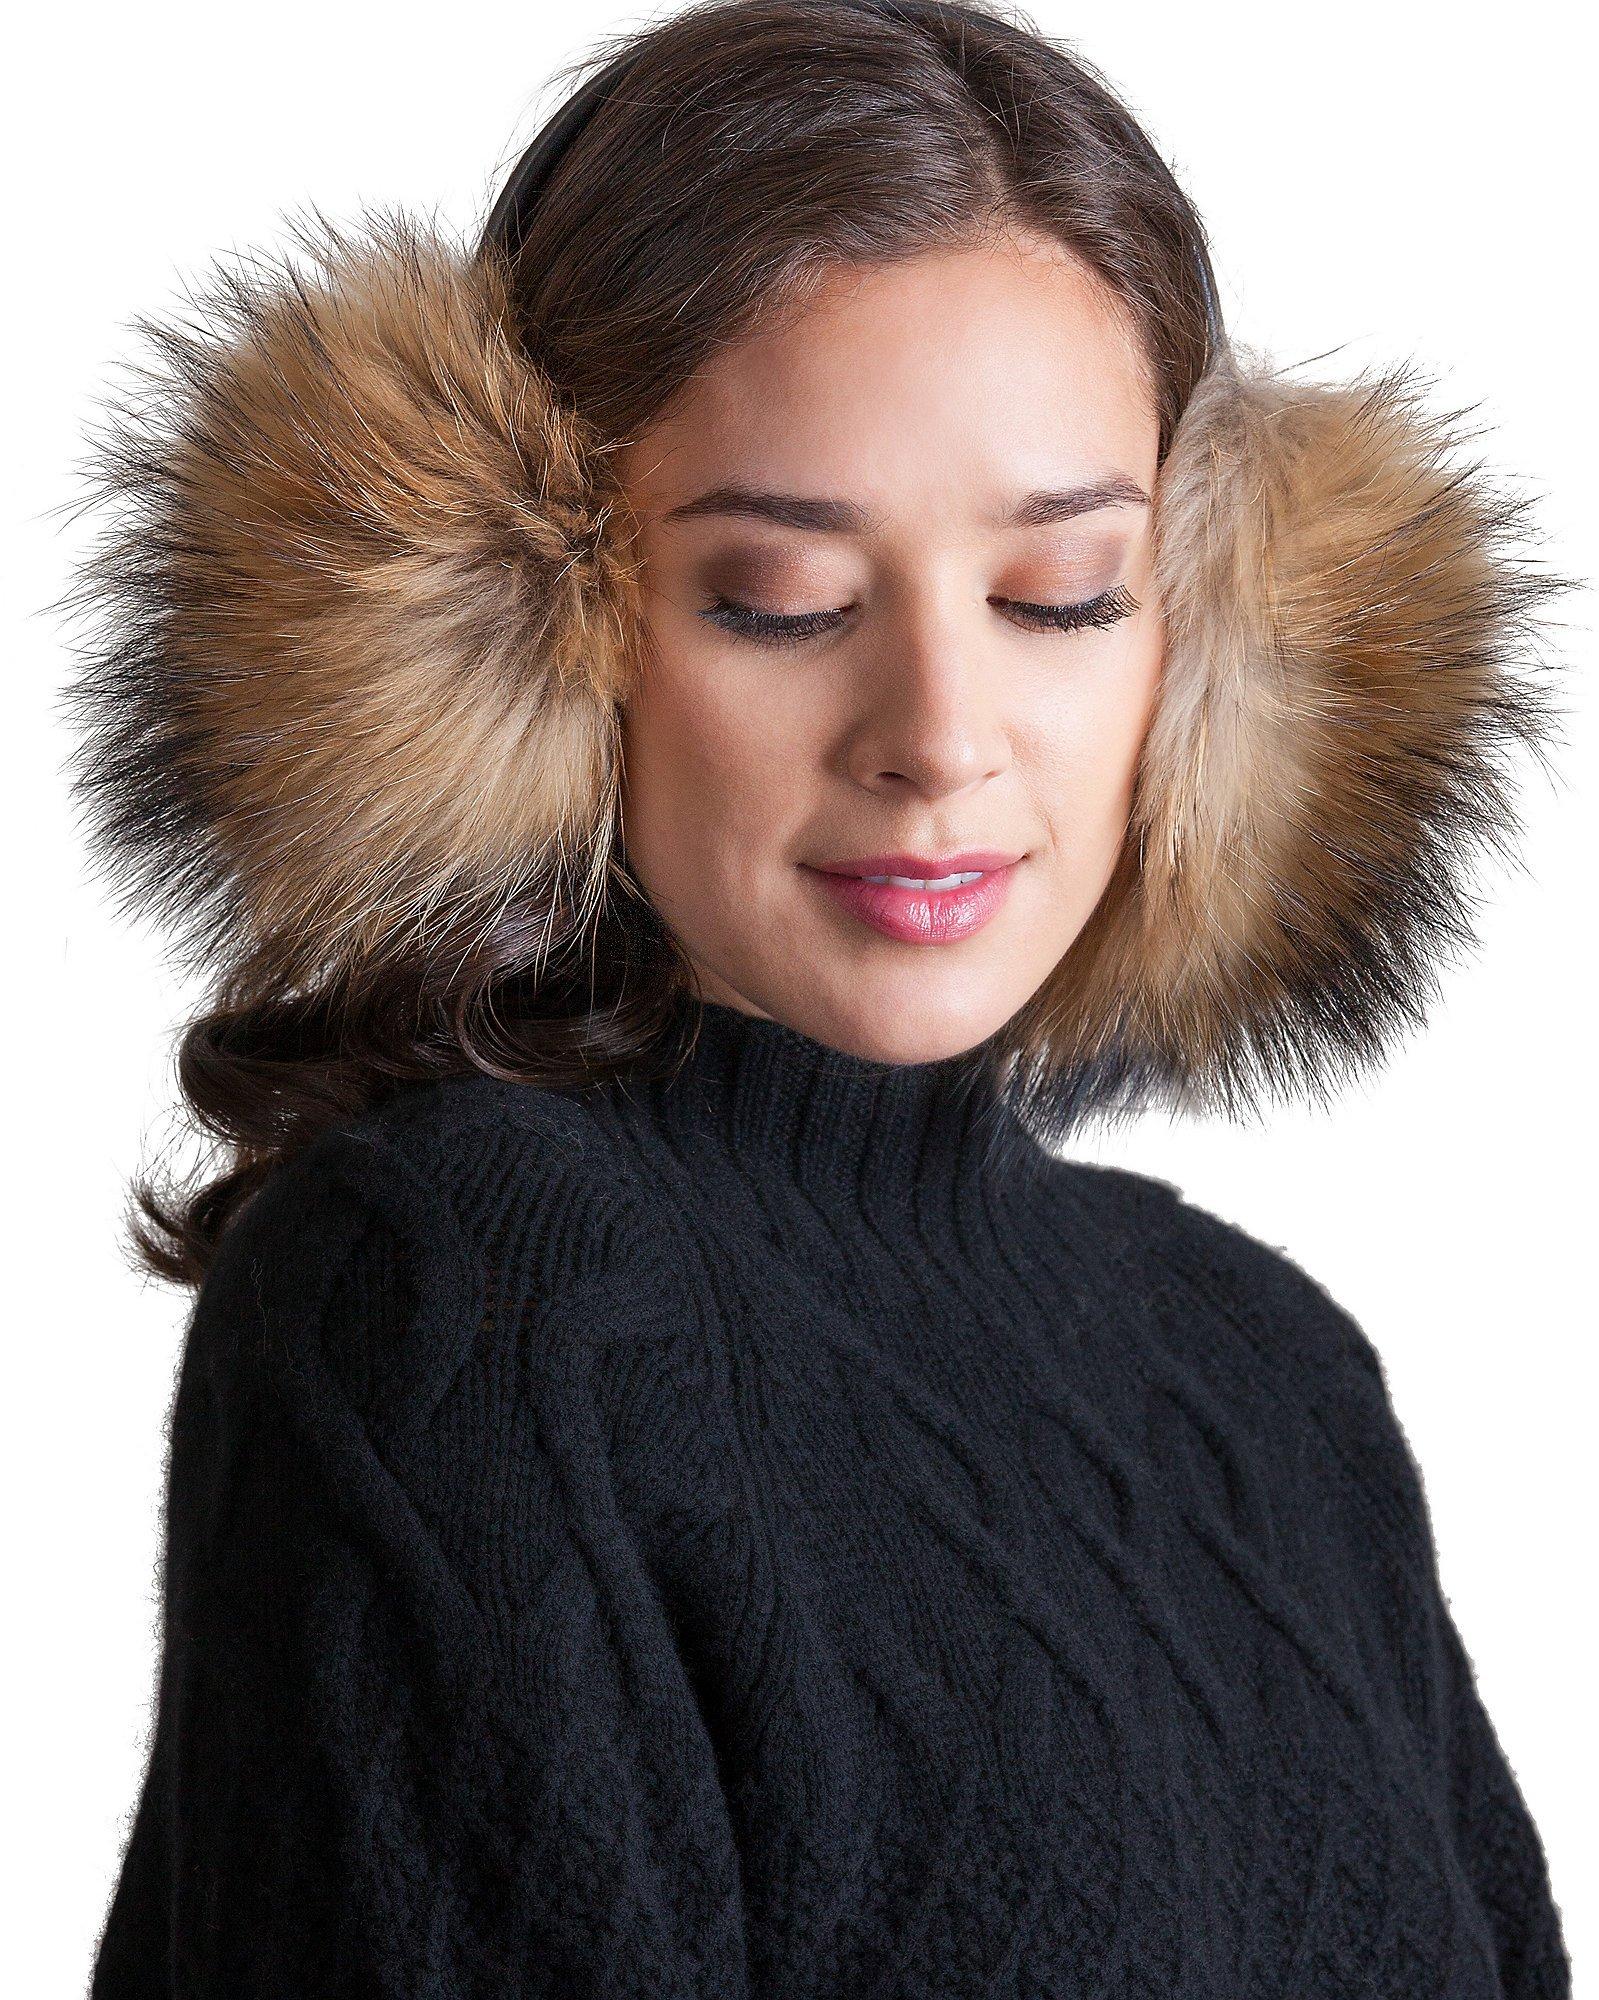 Finn Raccoon Fur Earmuffs by Overland Sheepskin Co (Image #1)